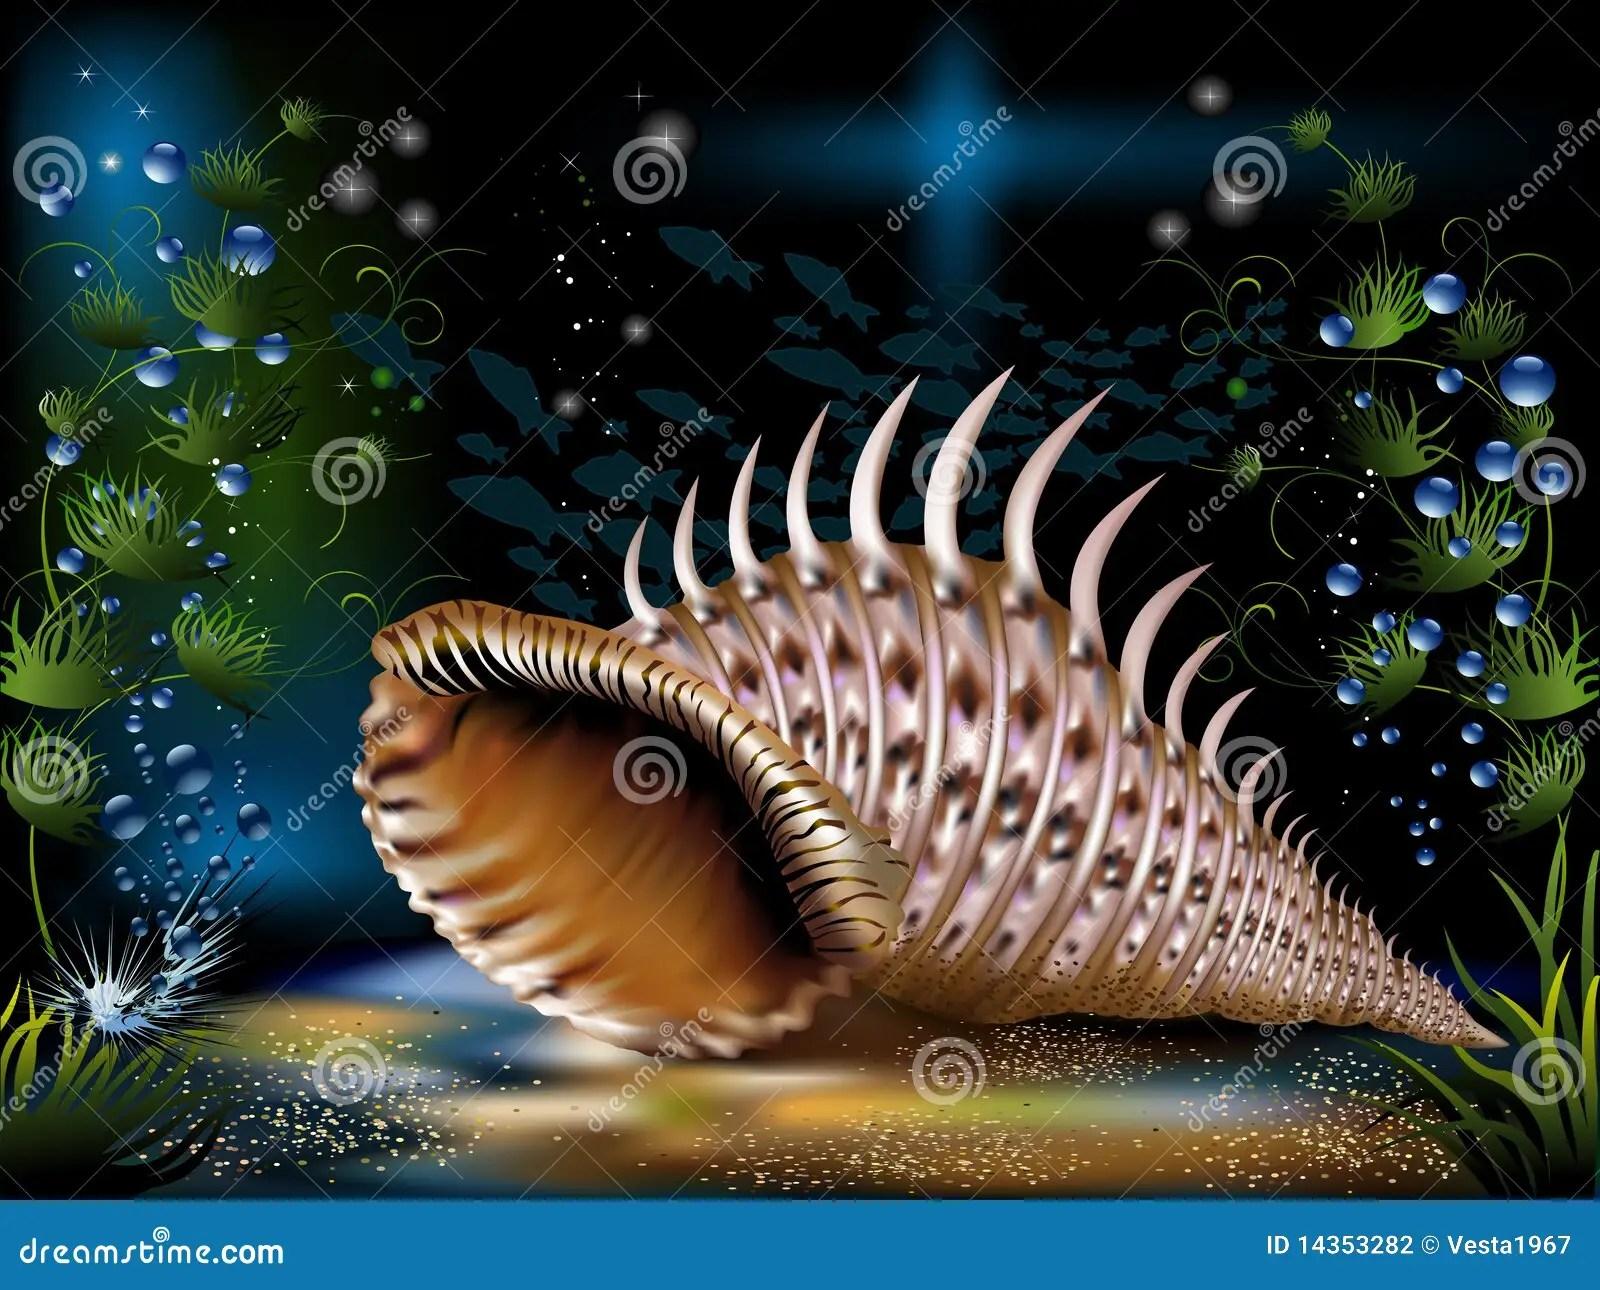 Green Animal Print Wallpaper Underwater World Stock Vector Image Of Illustration